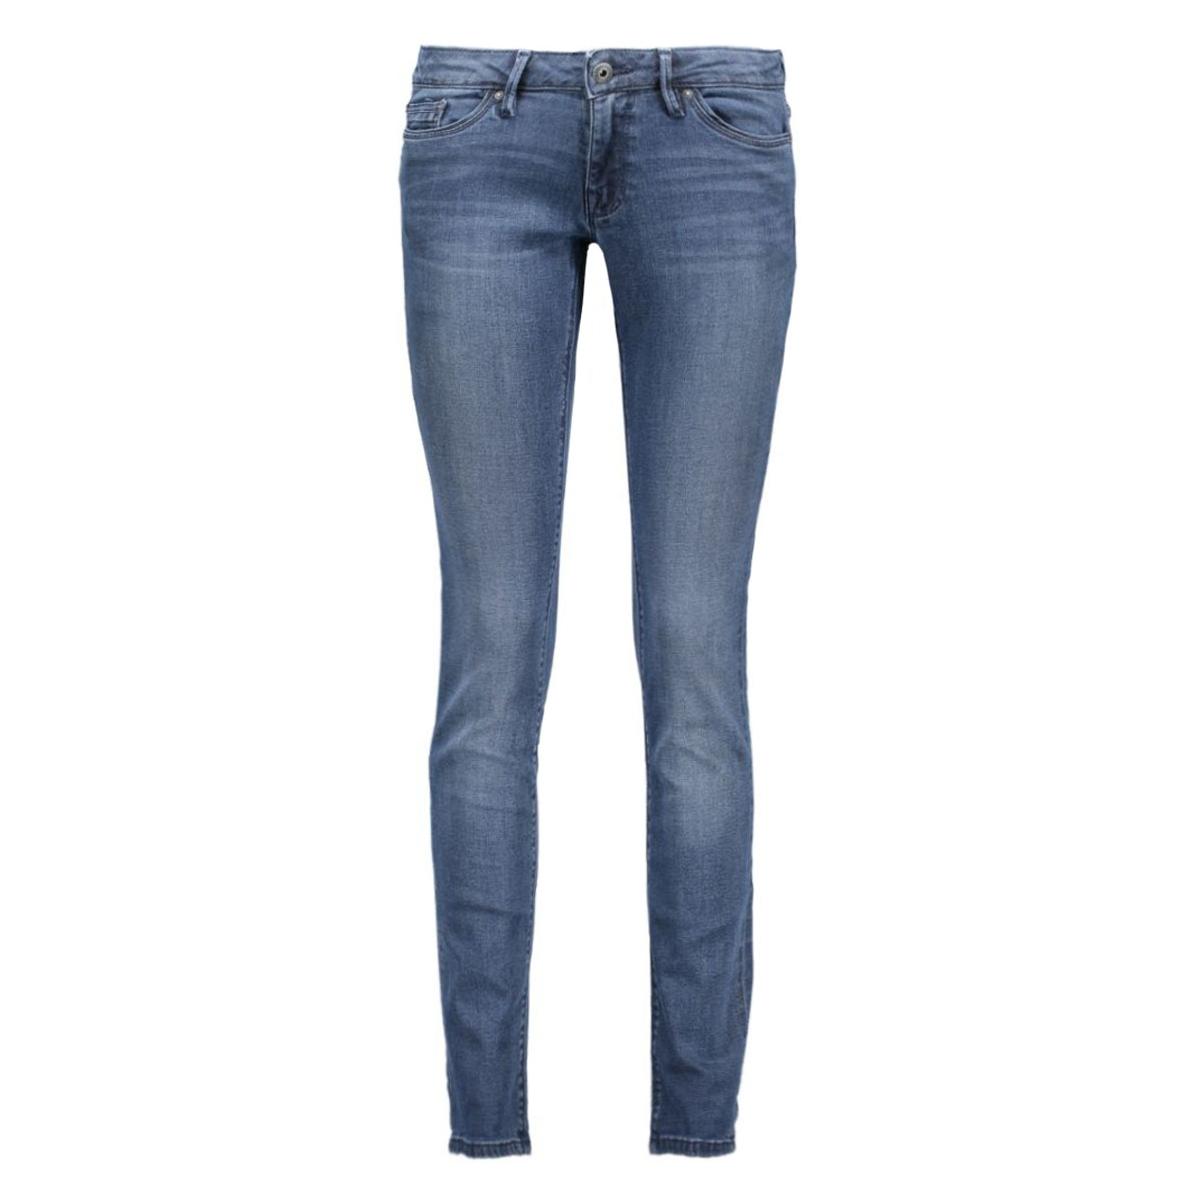 996cc1b915 edc jeans c901